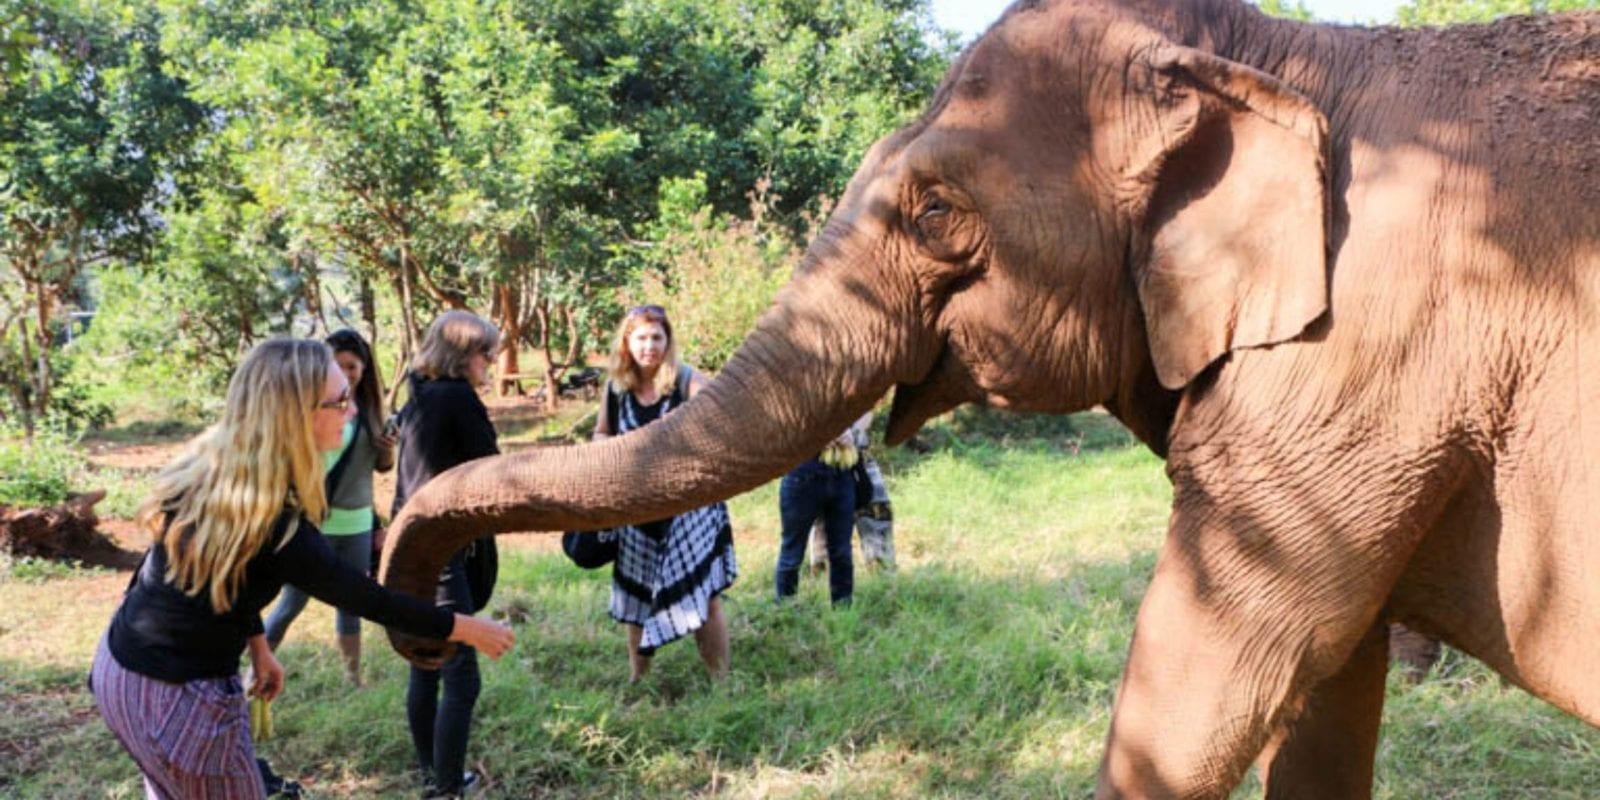 Feeding elephants at an ethical elephant sanctuary